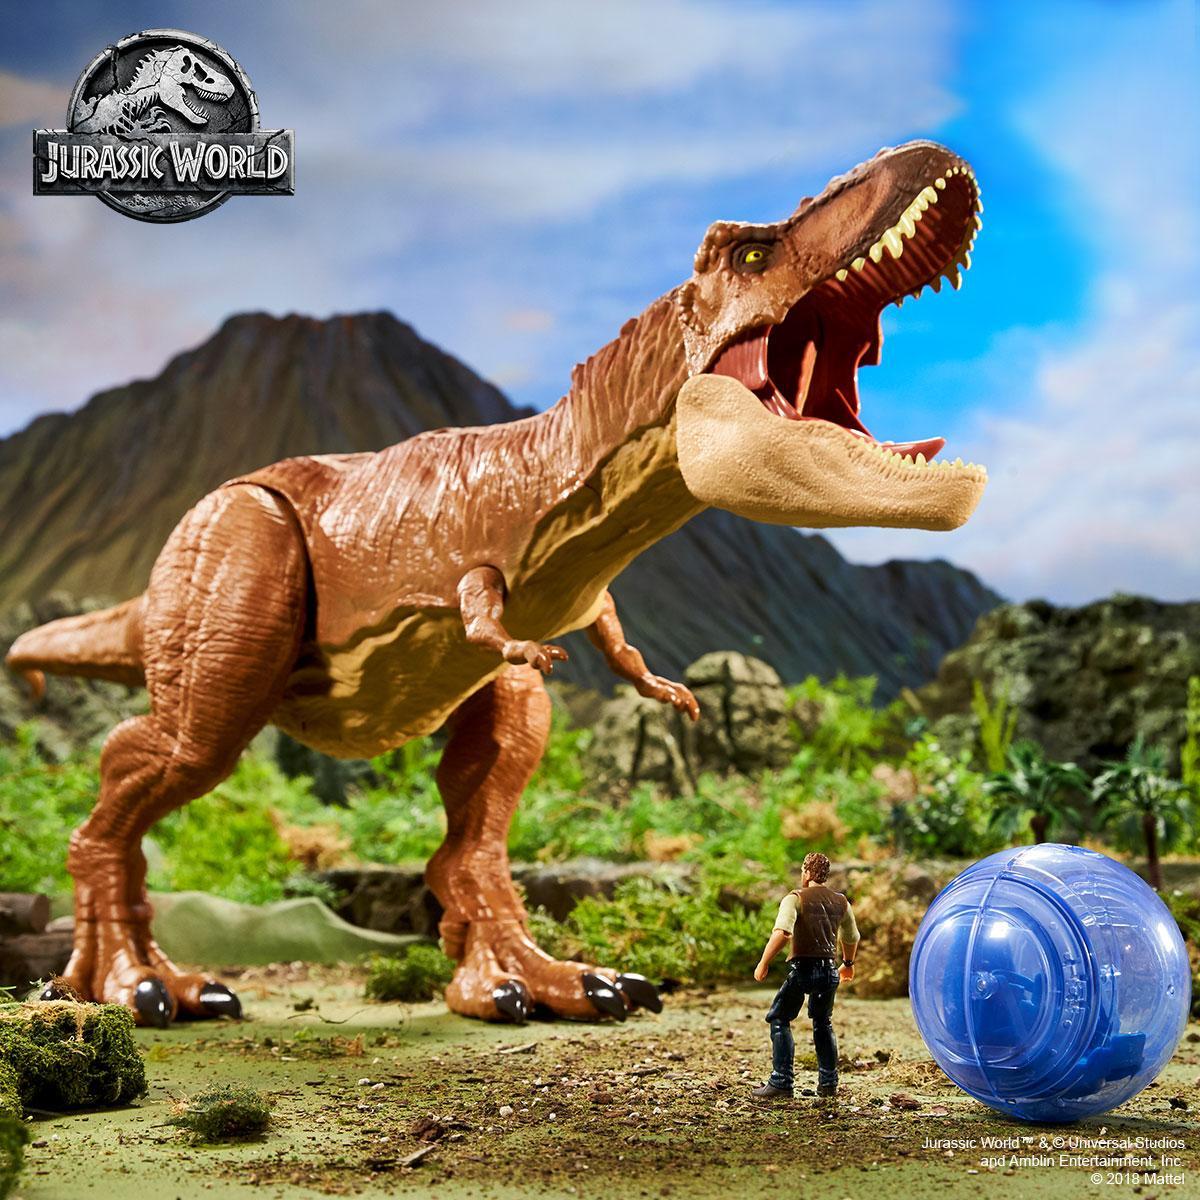 Mattel Lanza La Coleccion De Jurassic World El Reino Caido Jurassic world dinosaurio triceratops fossil mattel. moviementarios